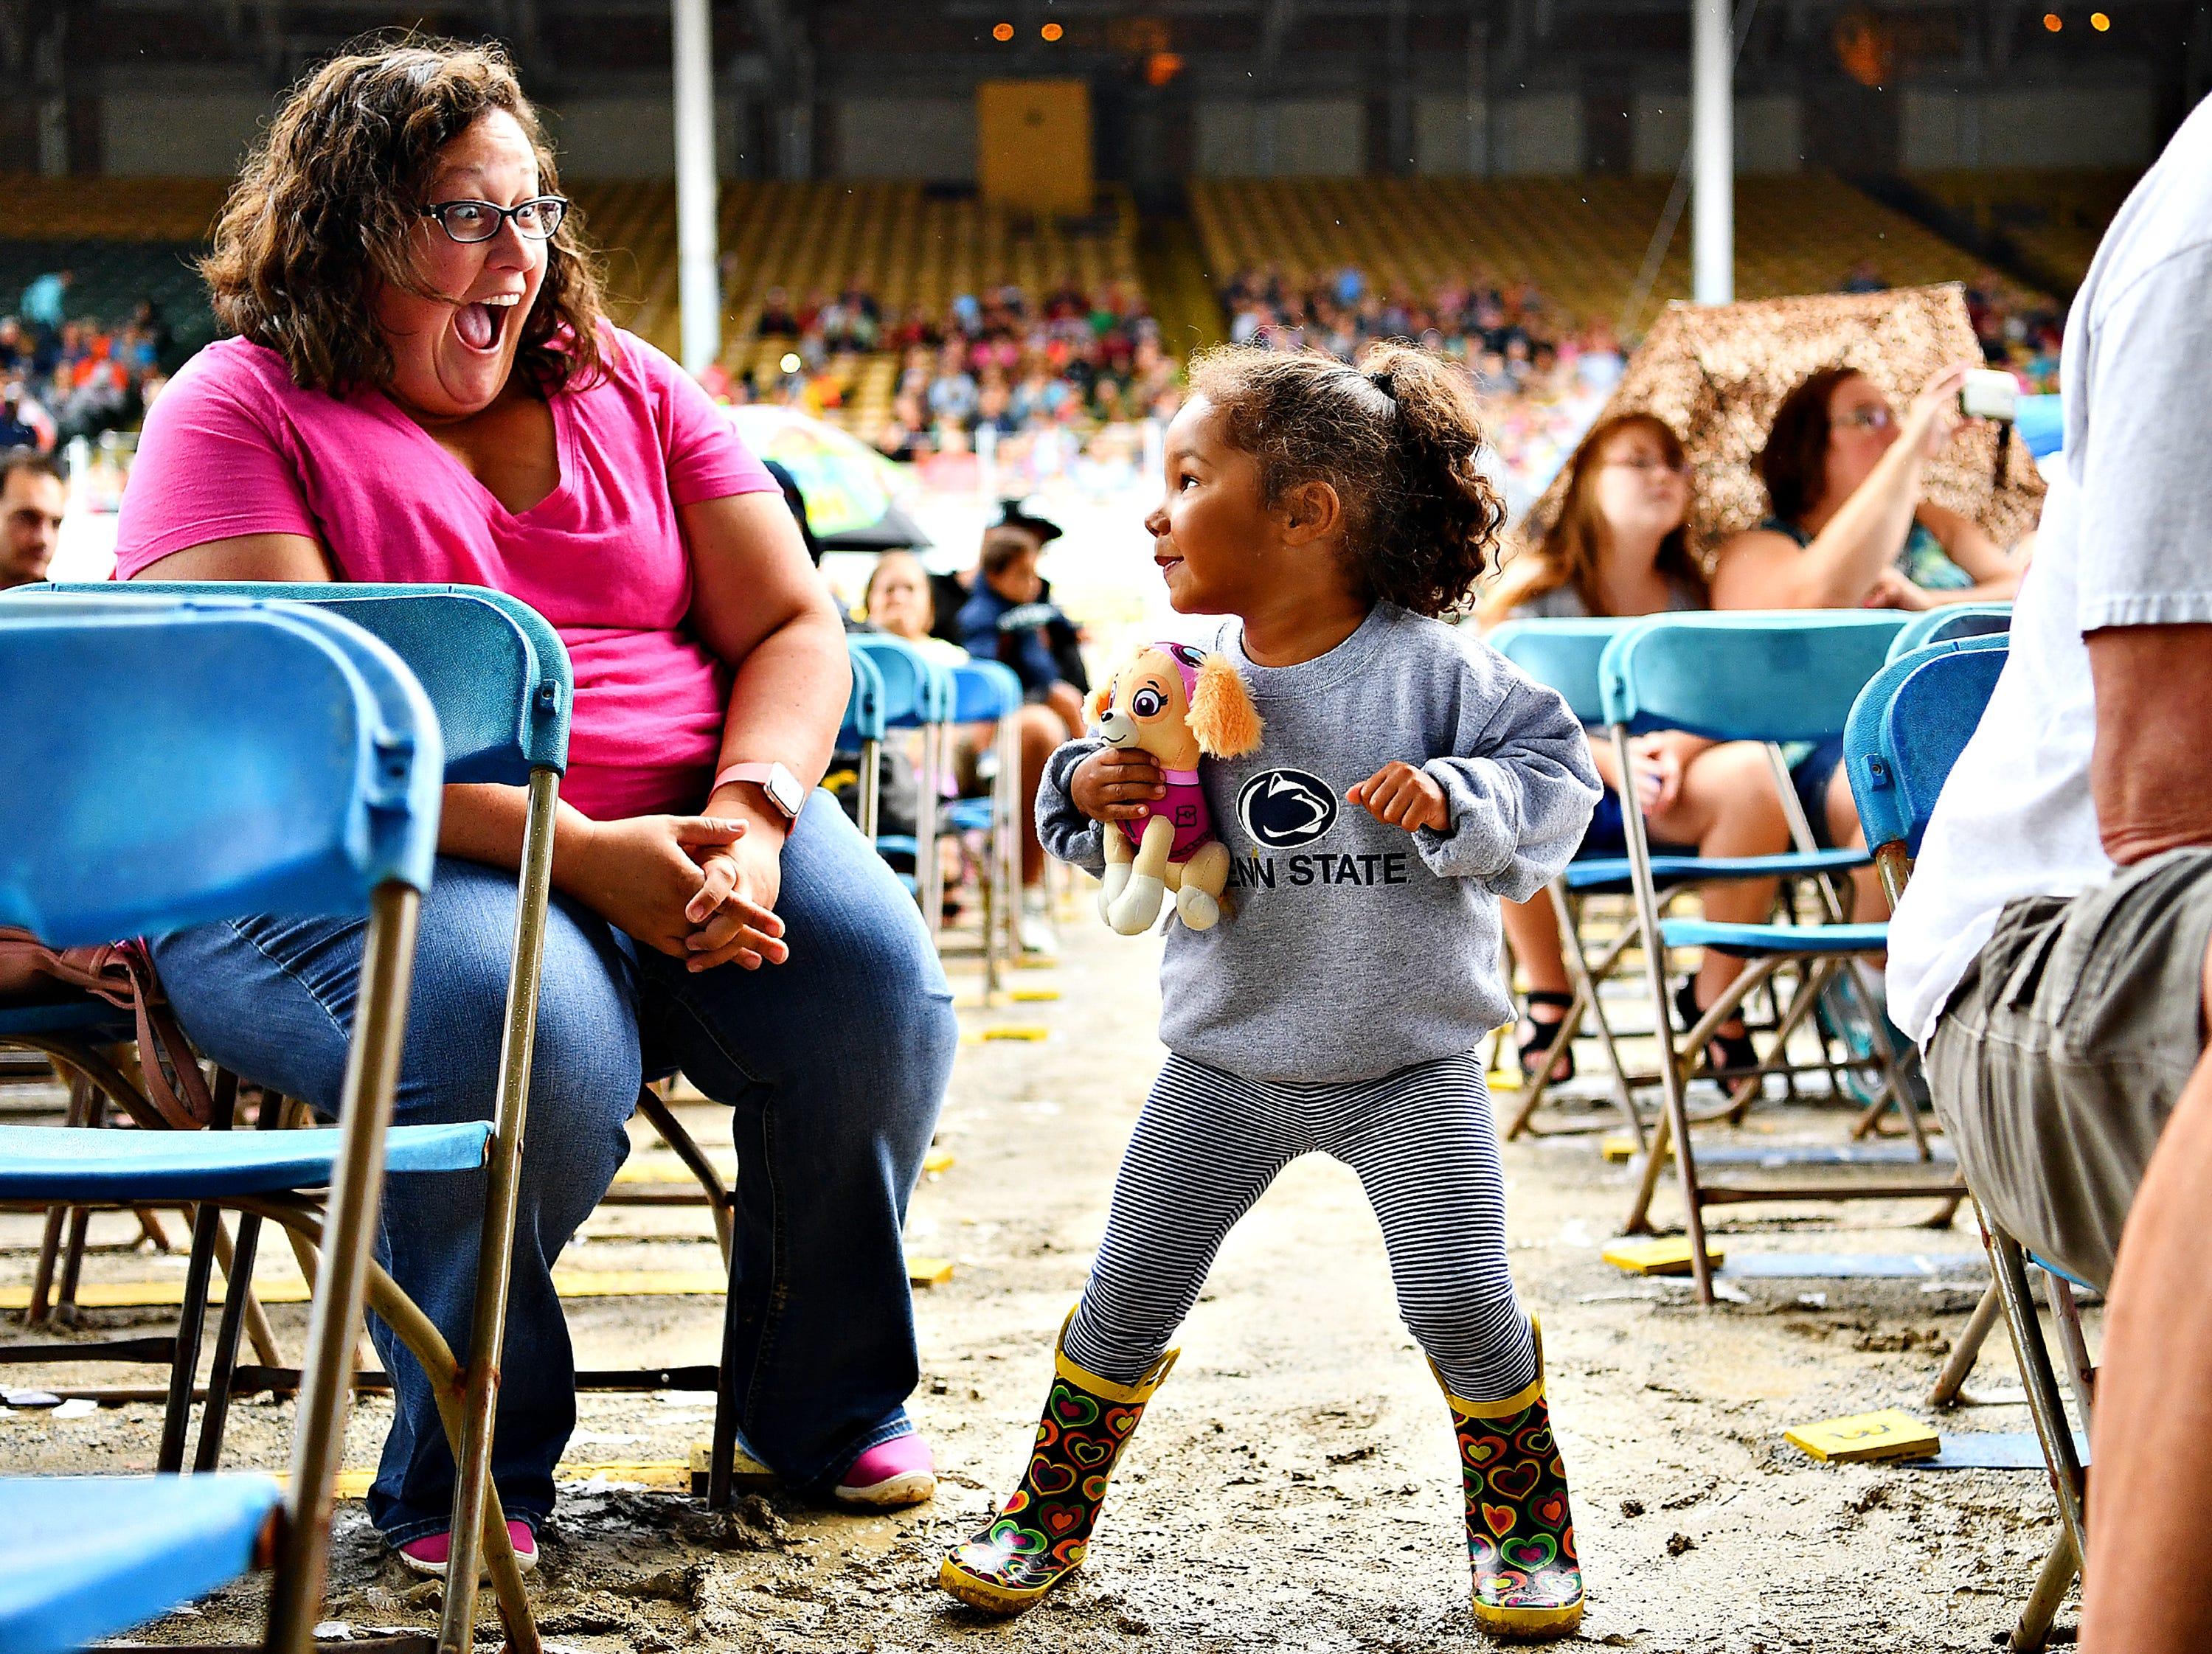 Julia Liddick, left, of York City, looks on as her daughter Averie Liddick, 2, dances during the early performance of Sesame Street Live at York Fair, Saturday, Sept. 8, 2018. Dawn J. Sagert photo